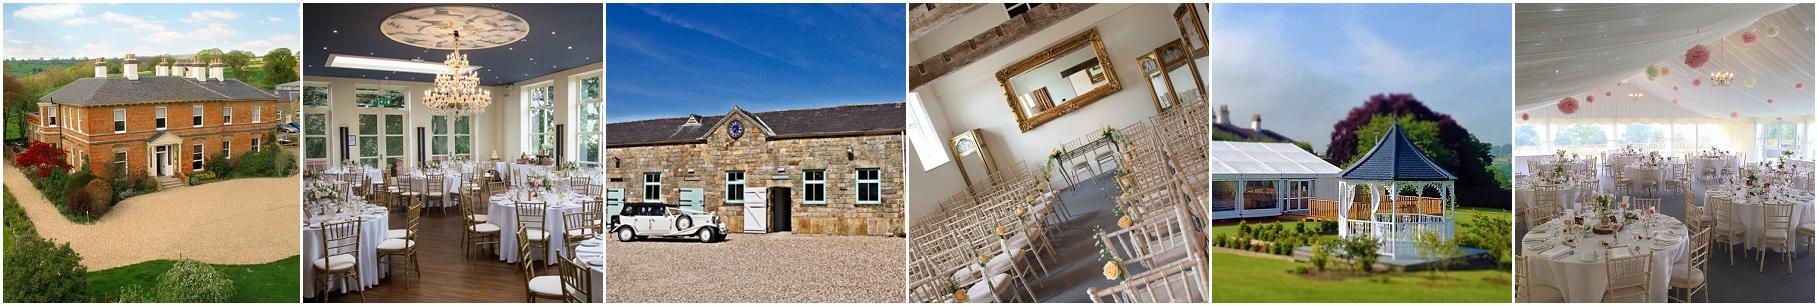 Shottle Hall Photos- Derbyshire Wedding Venues